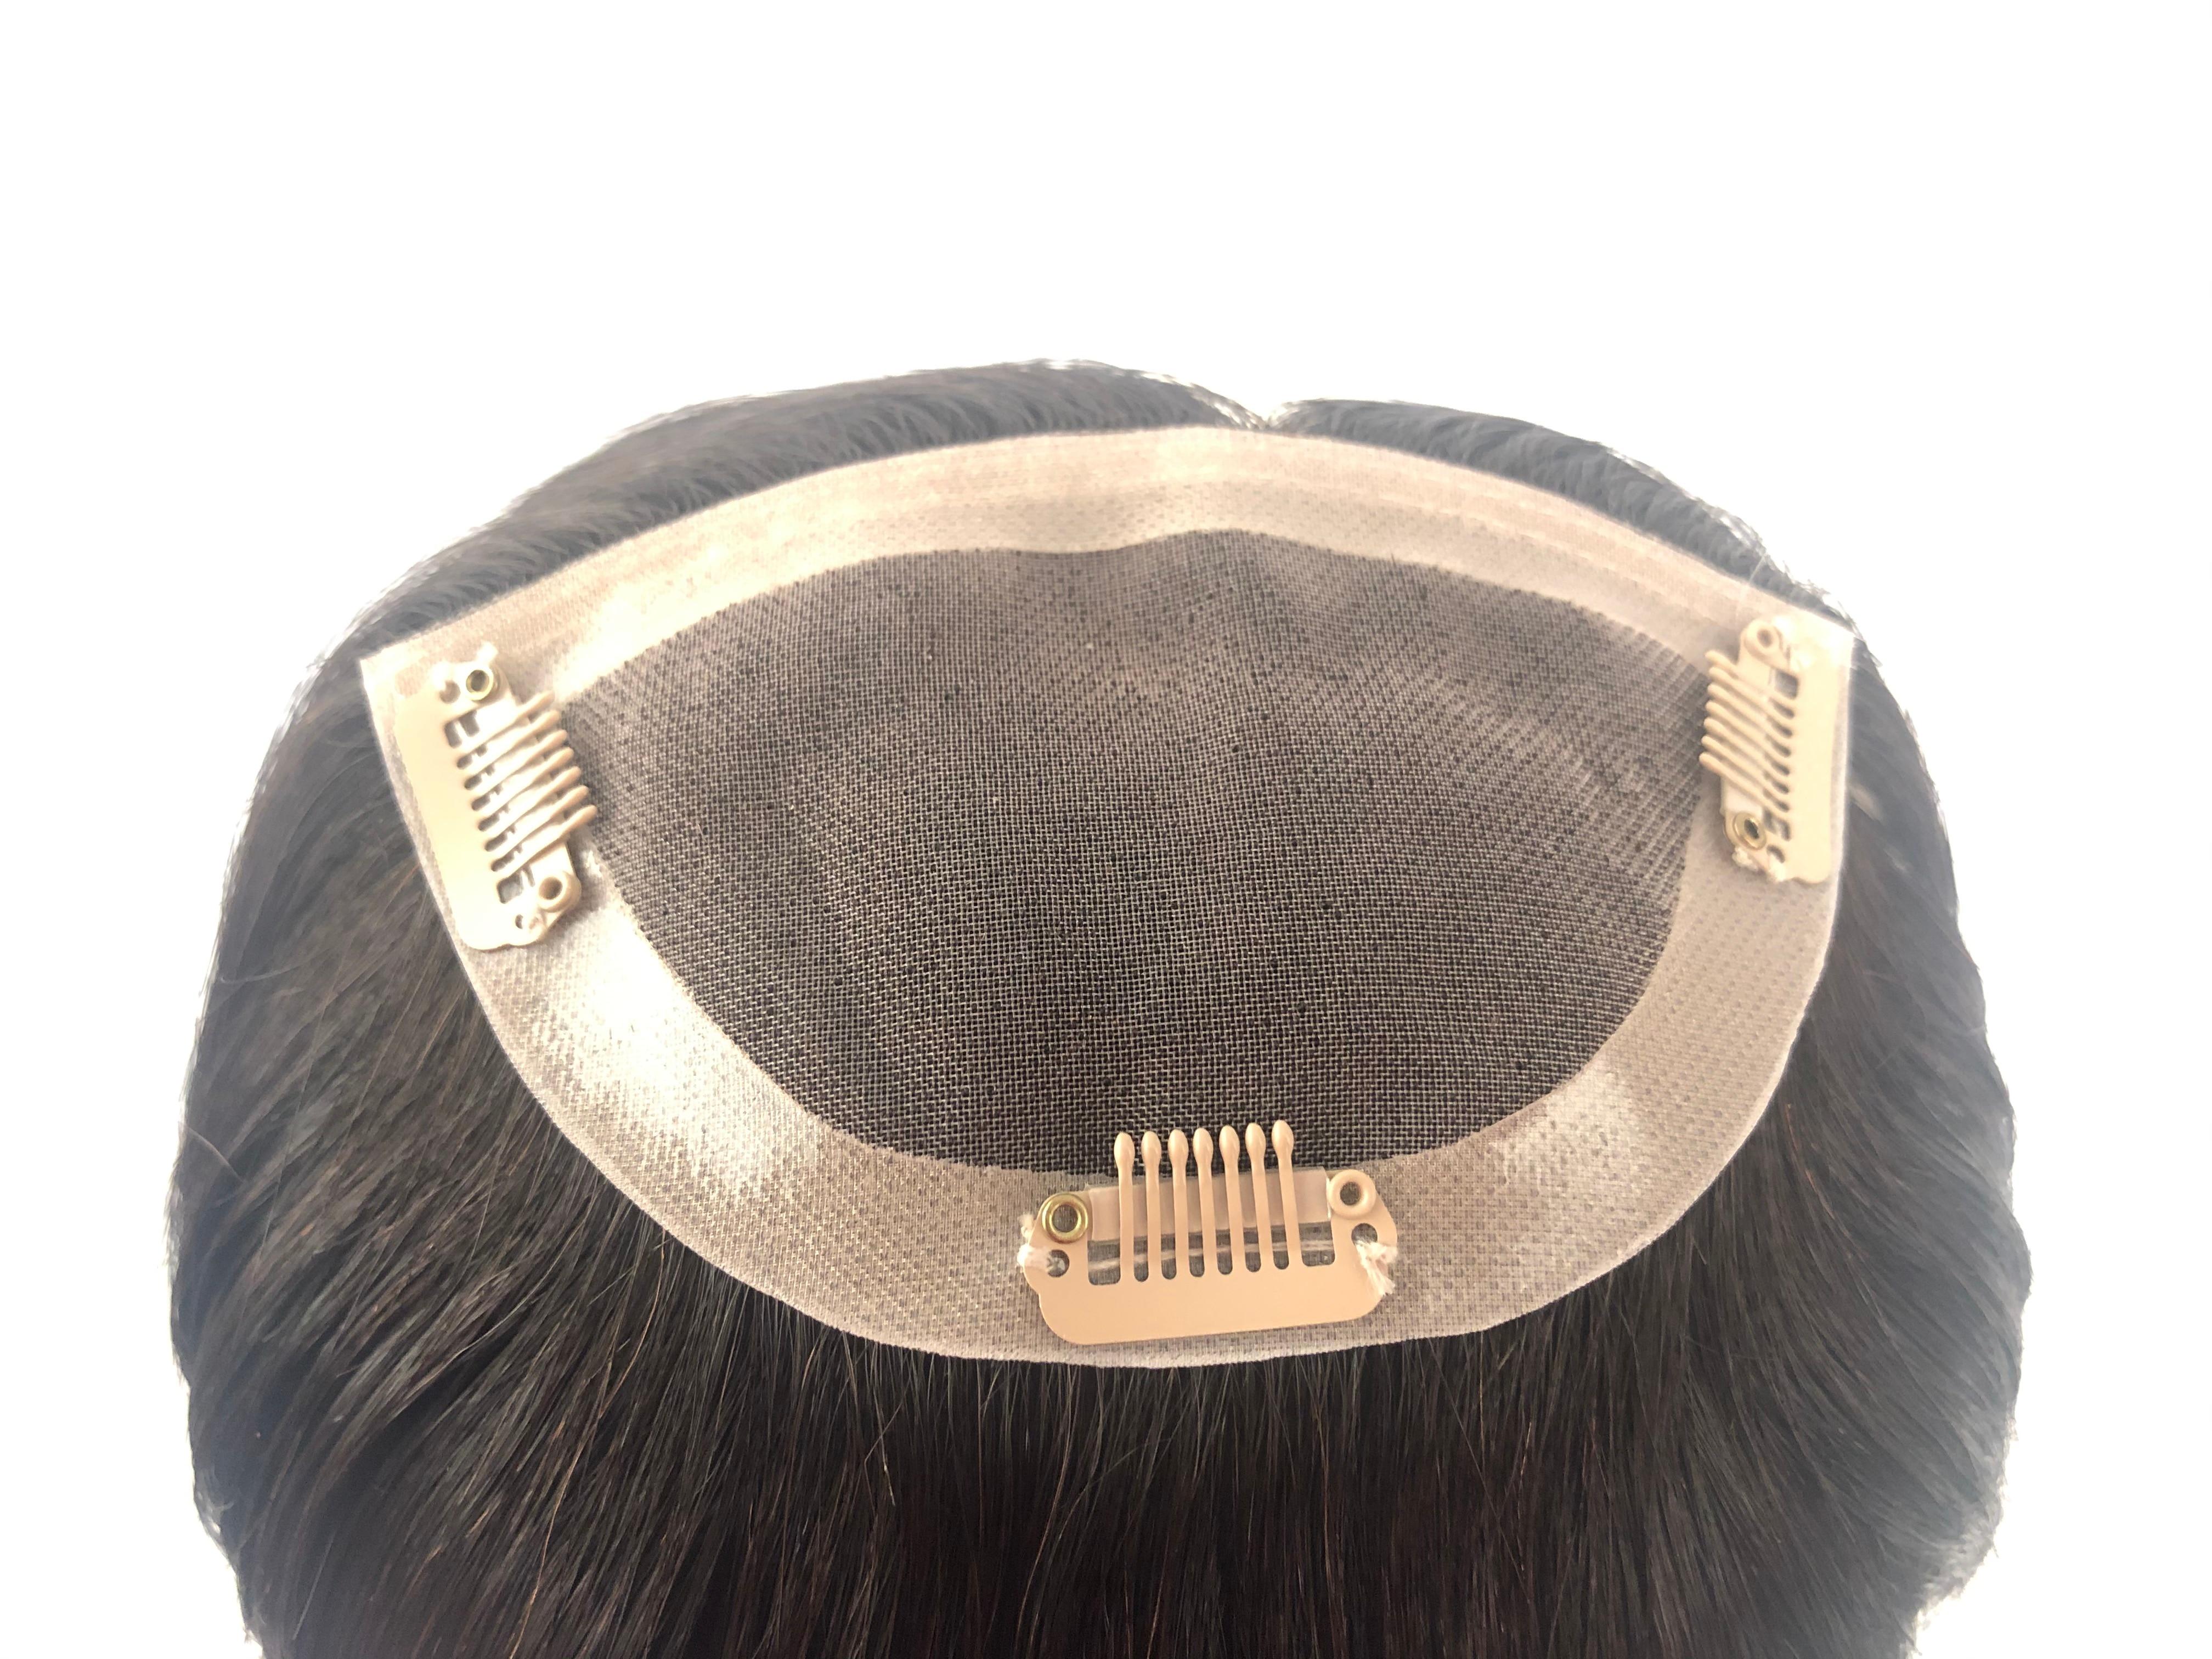 de topper do cabelo humano respirável mono